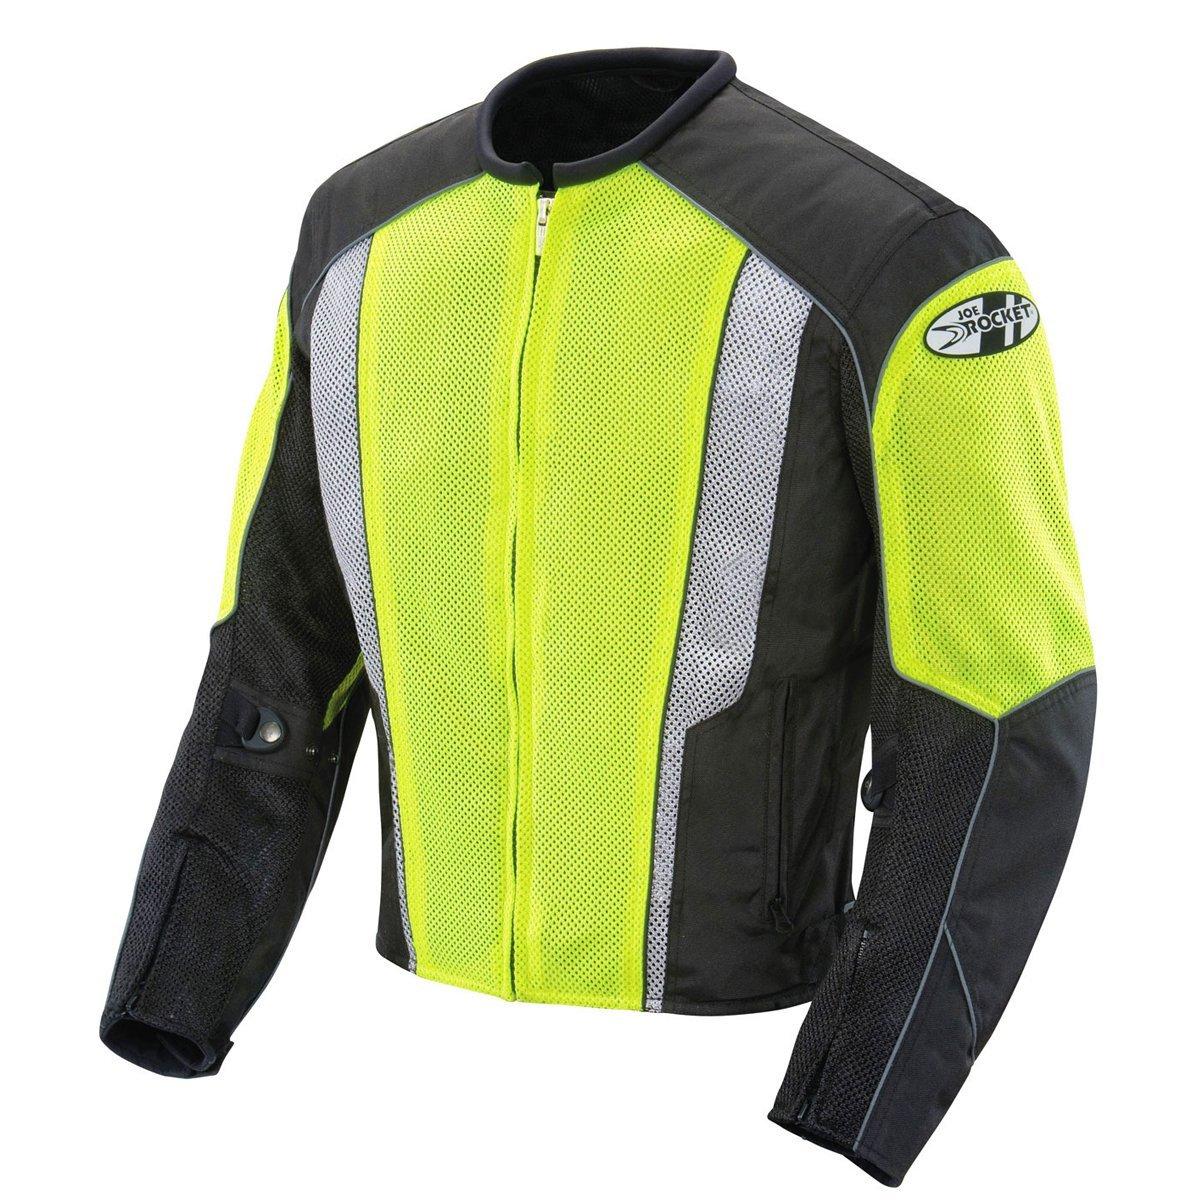 Joe Rocket Phoenix 5.0 Mens Neon/Black Mesh Motorcycle Jacket - X-Large